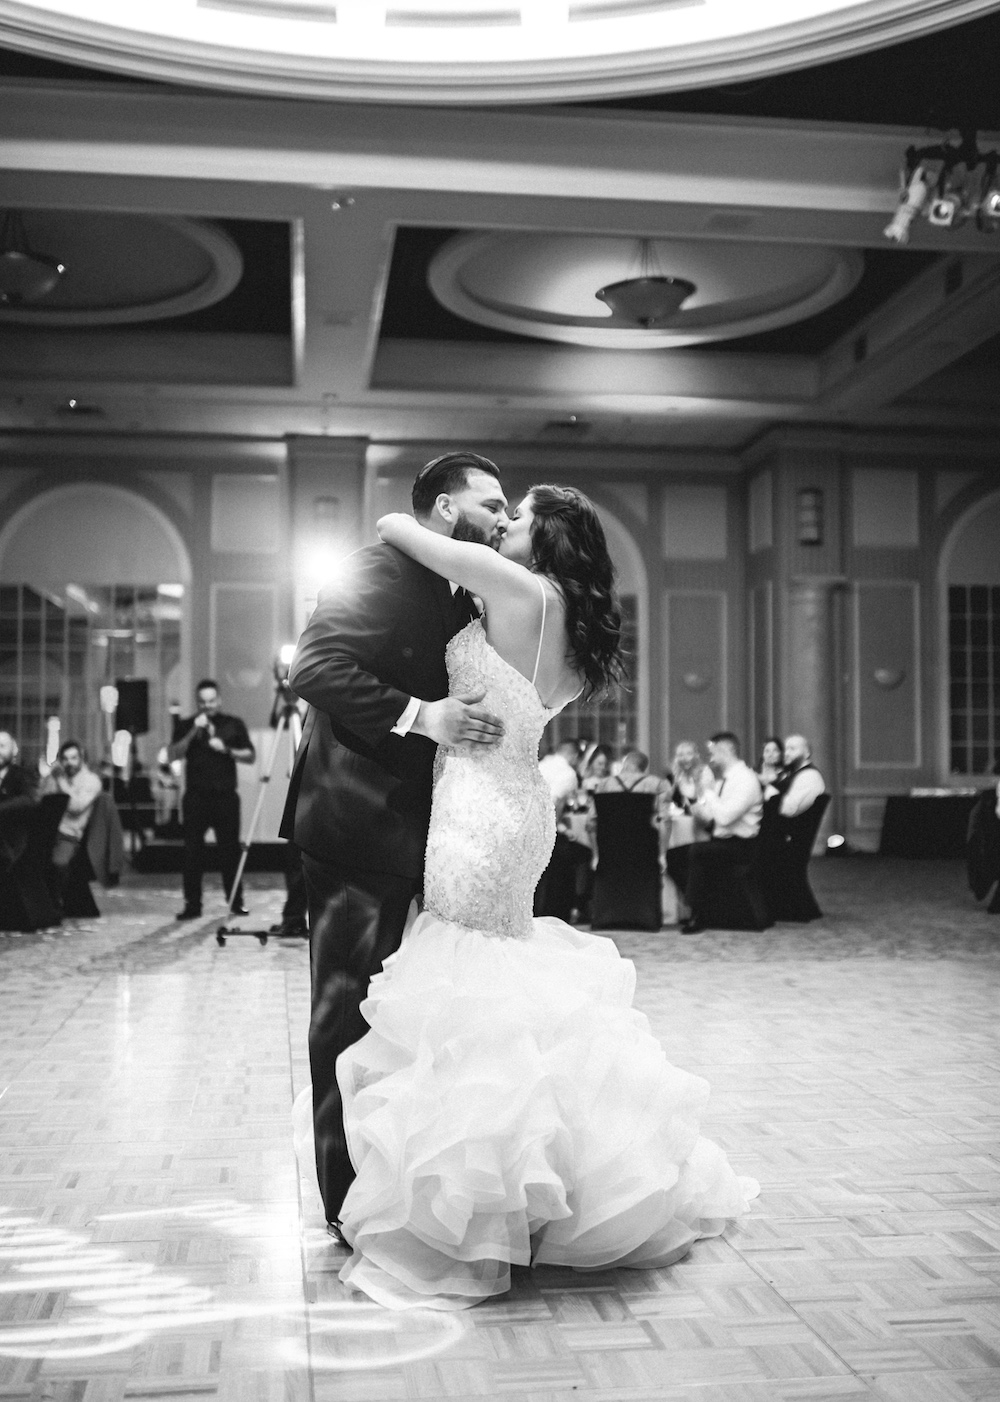 Weddings by Matt Steeves Photography The Chase Center Wilmington Ballroom Reception 9.jpg